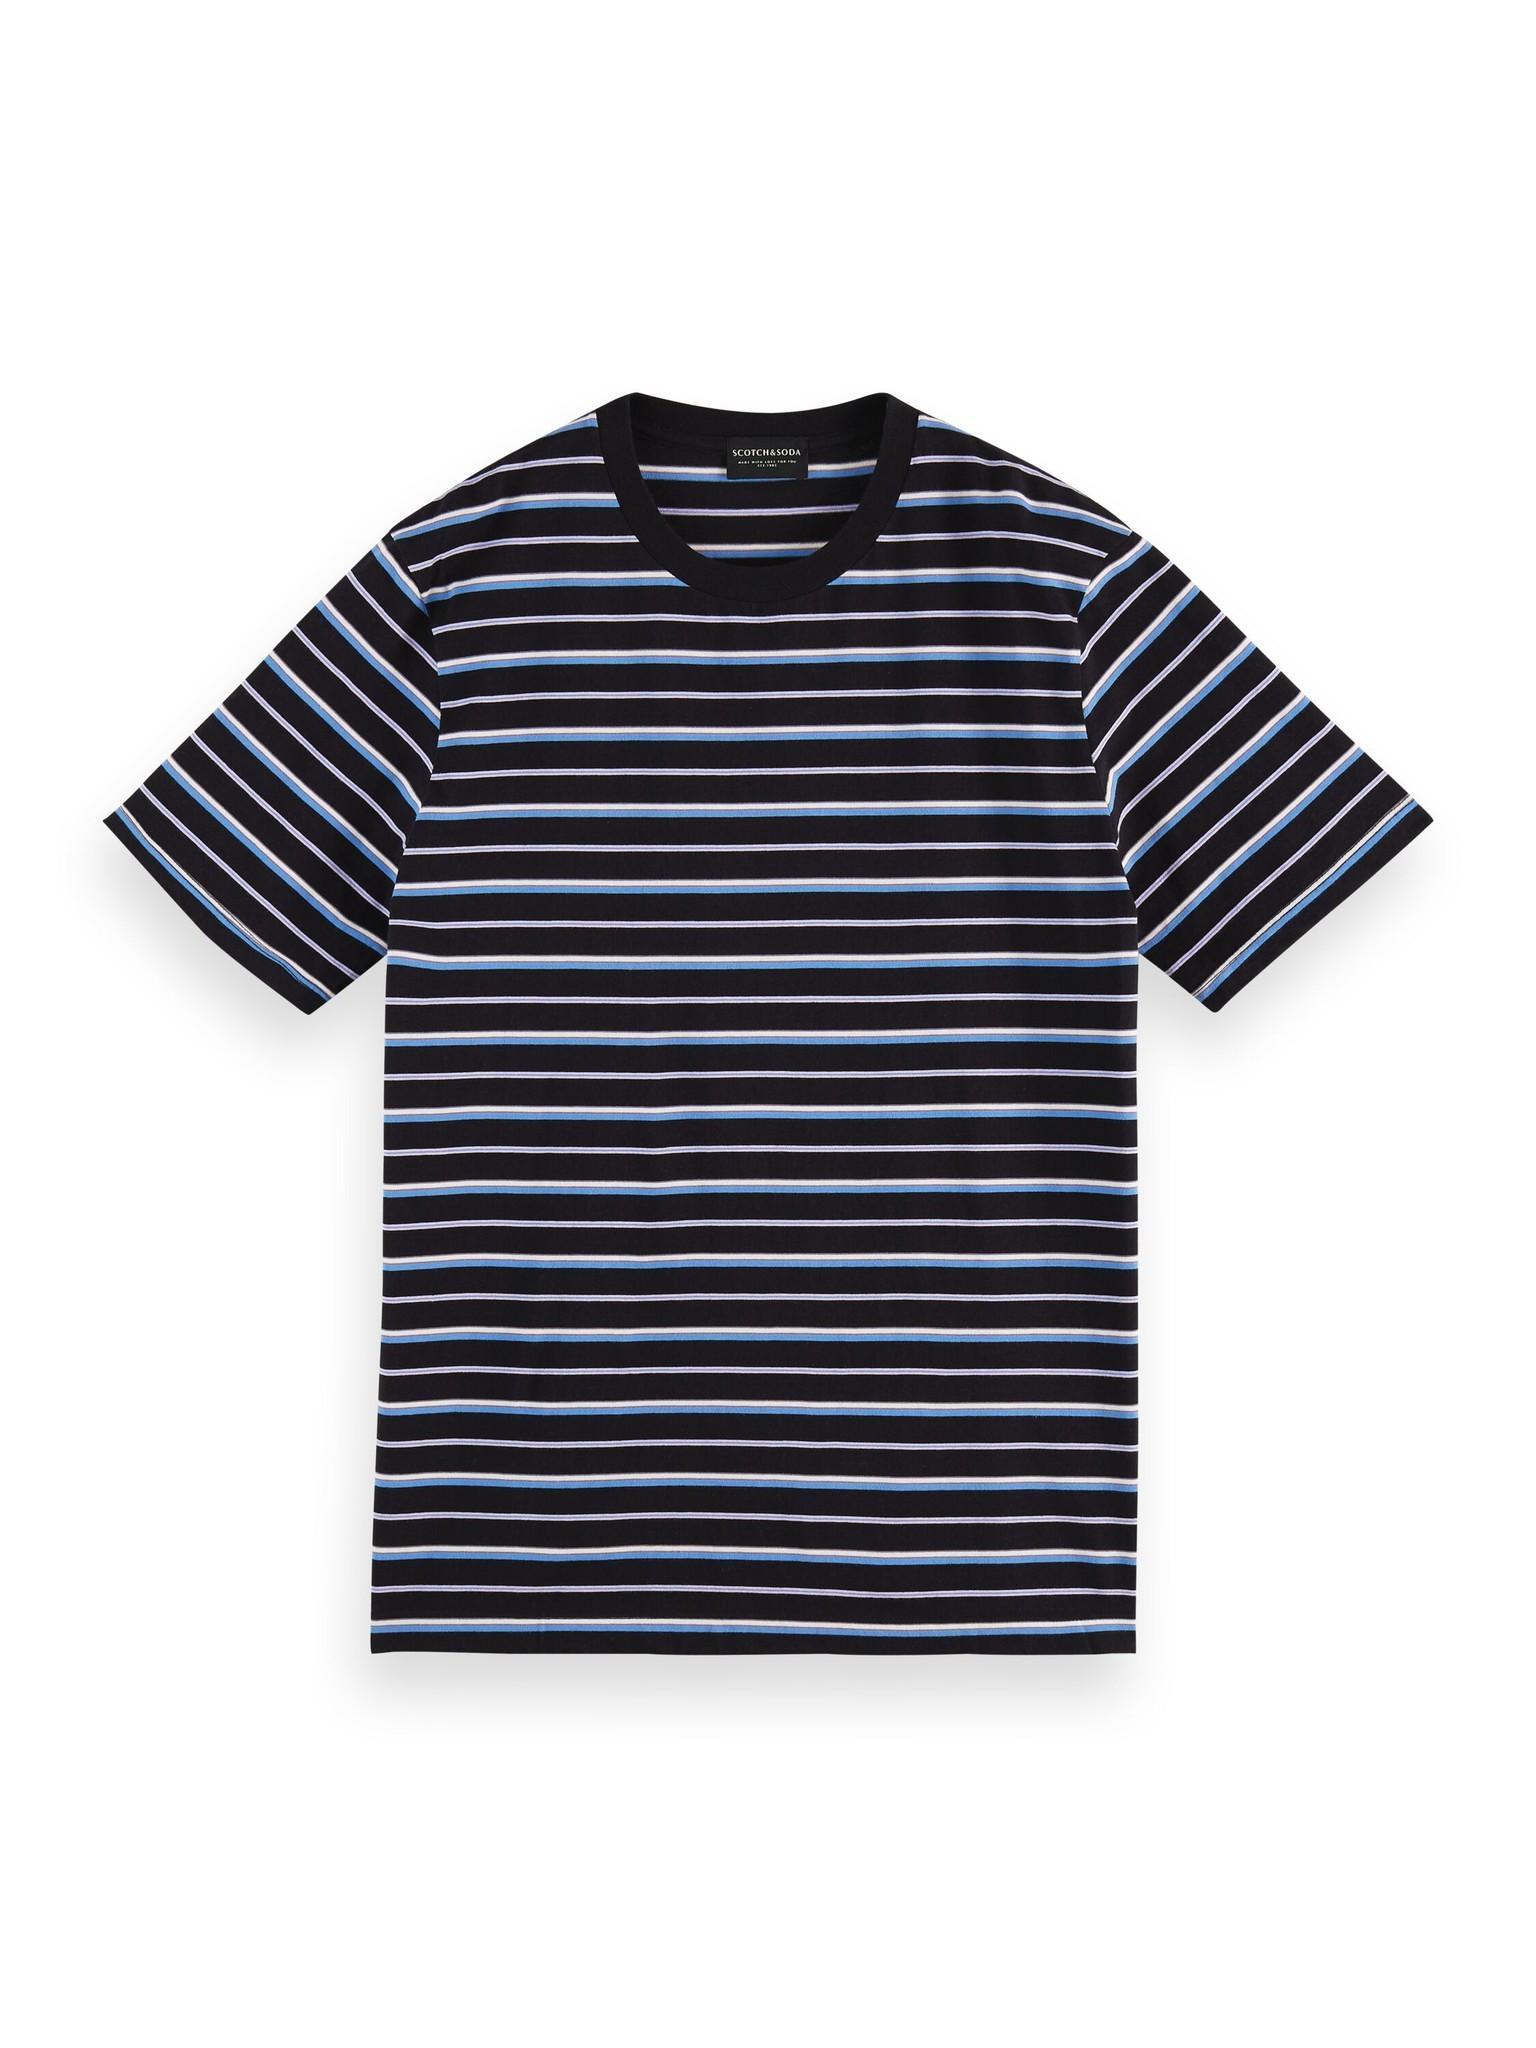 Scotch & Soda T-shirt Scotch & Soda 160854-0220